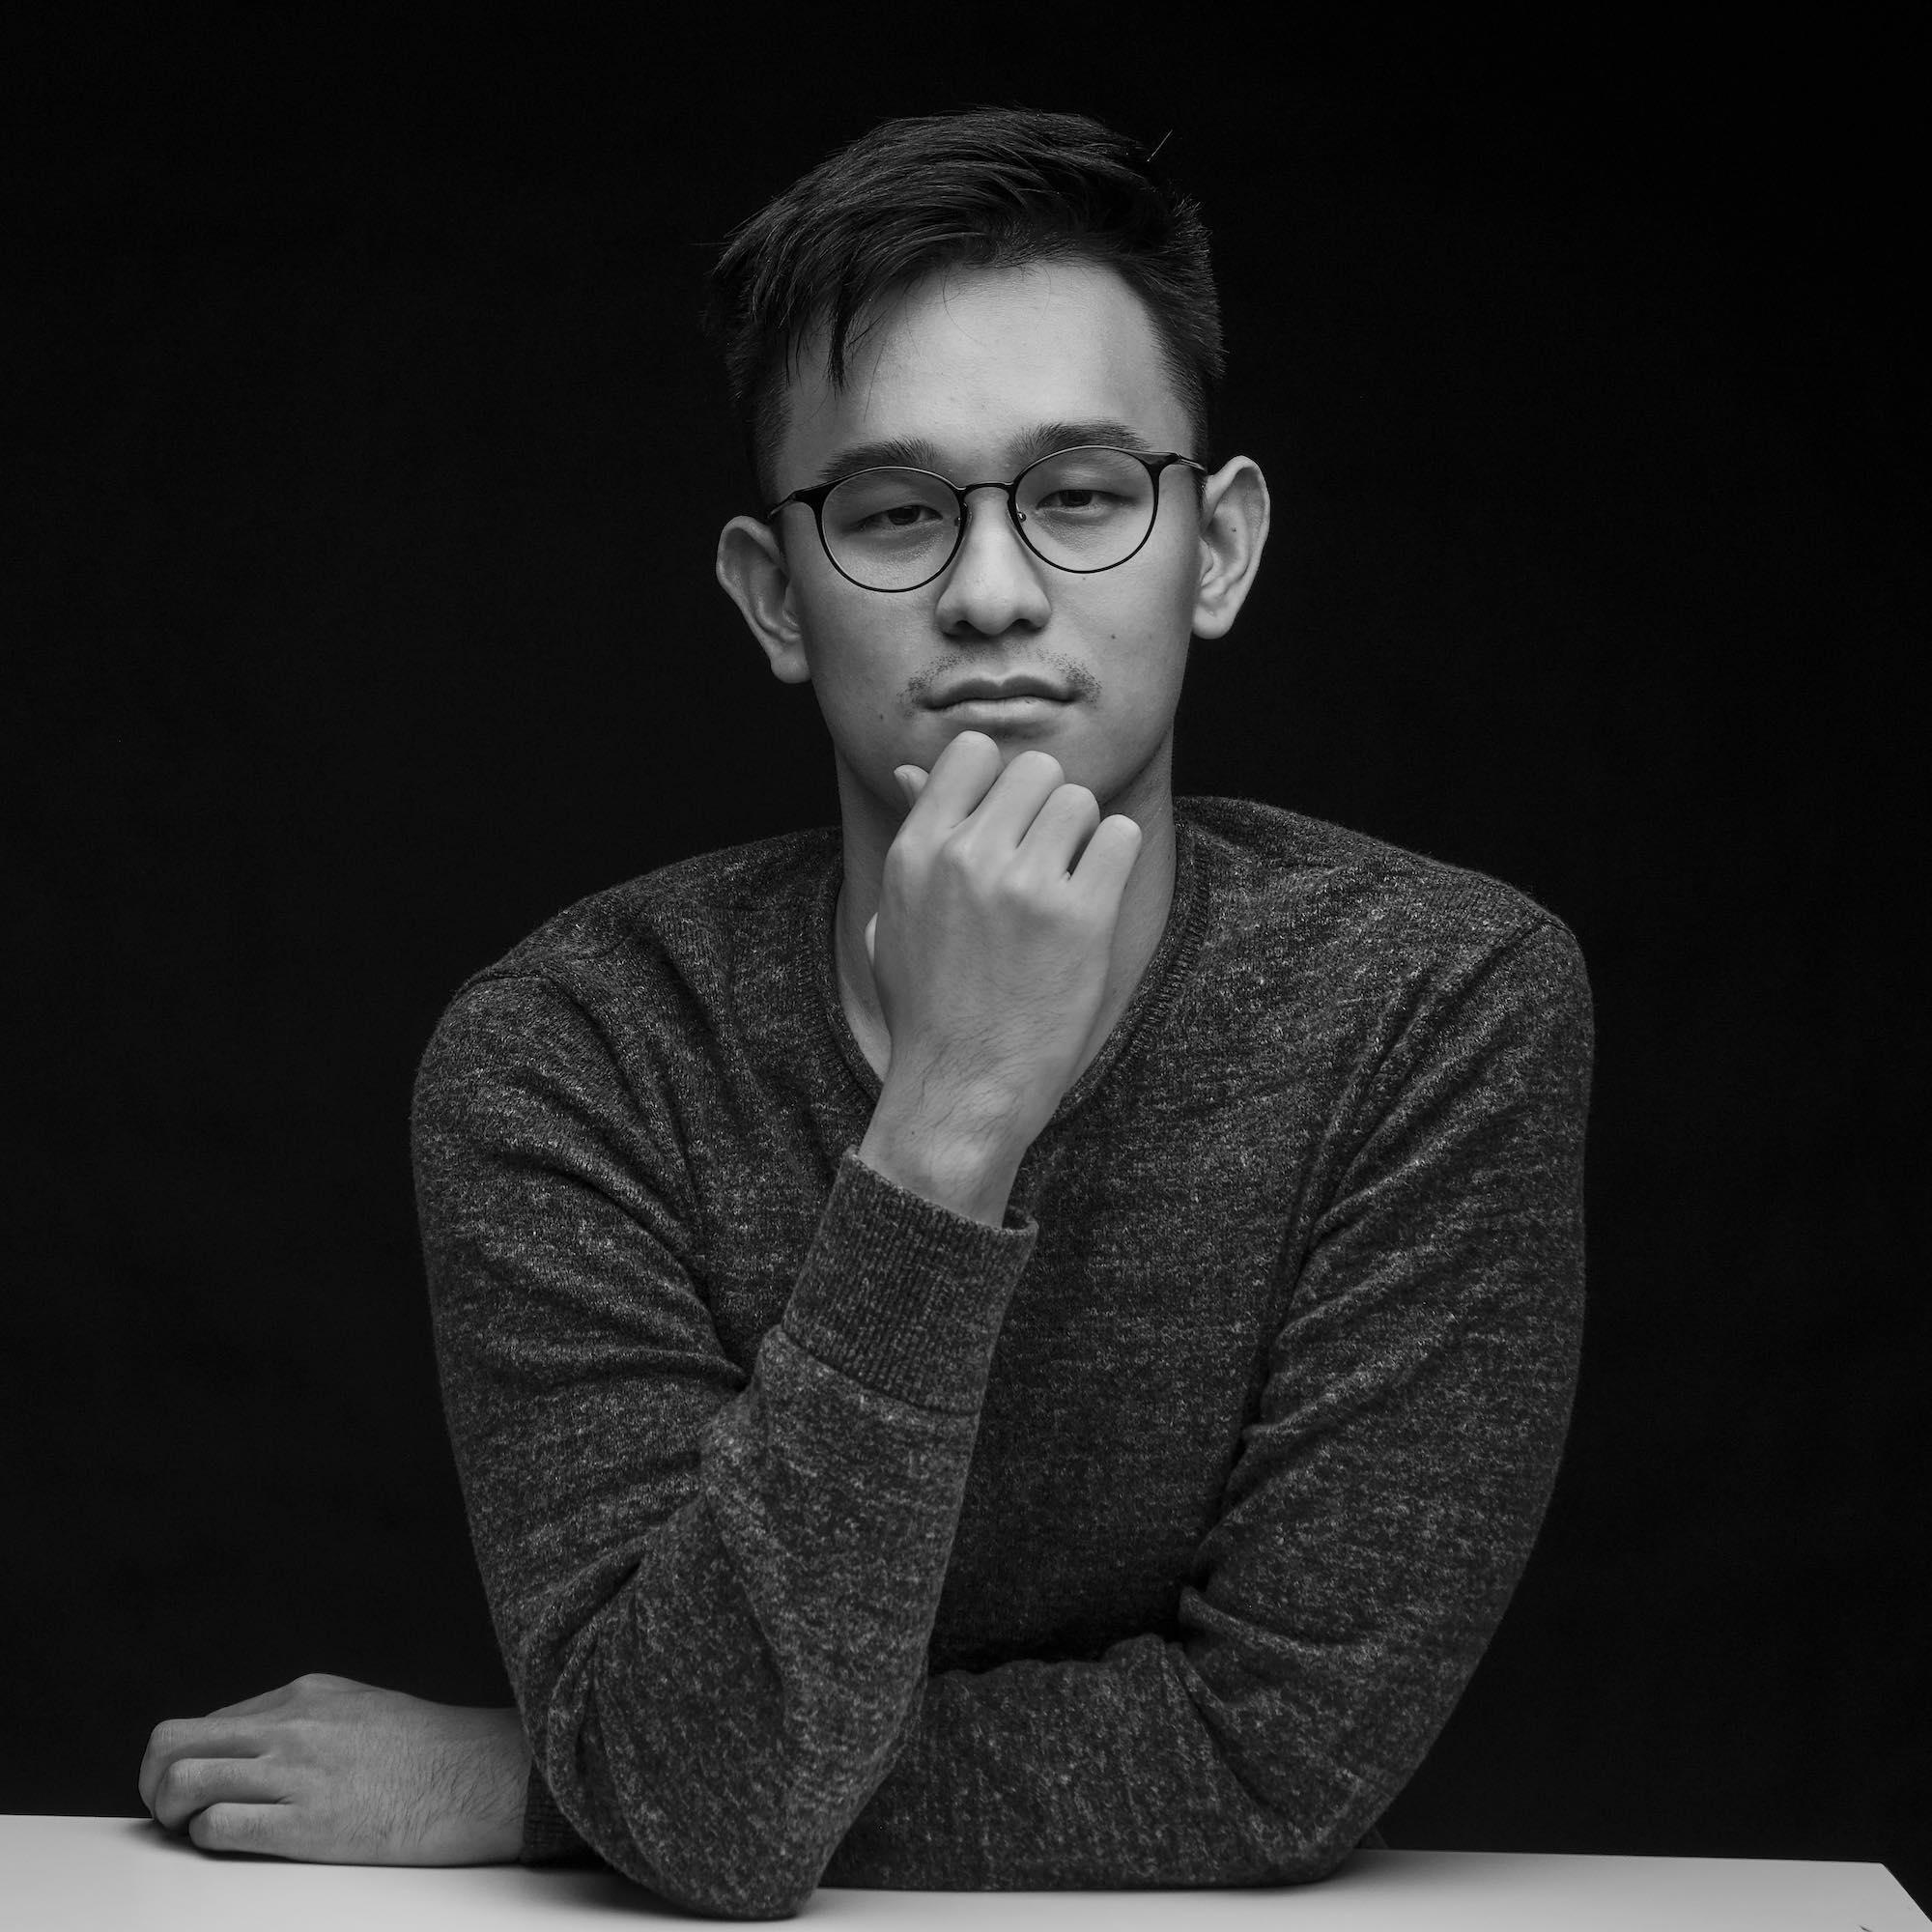 Dylan man Commercial Editorial Portraiture Documentary Photographer fujifilm Director Singapore Jose Jeuland photography fashion street artist